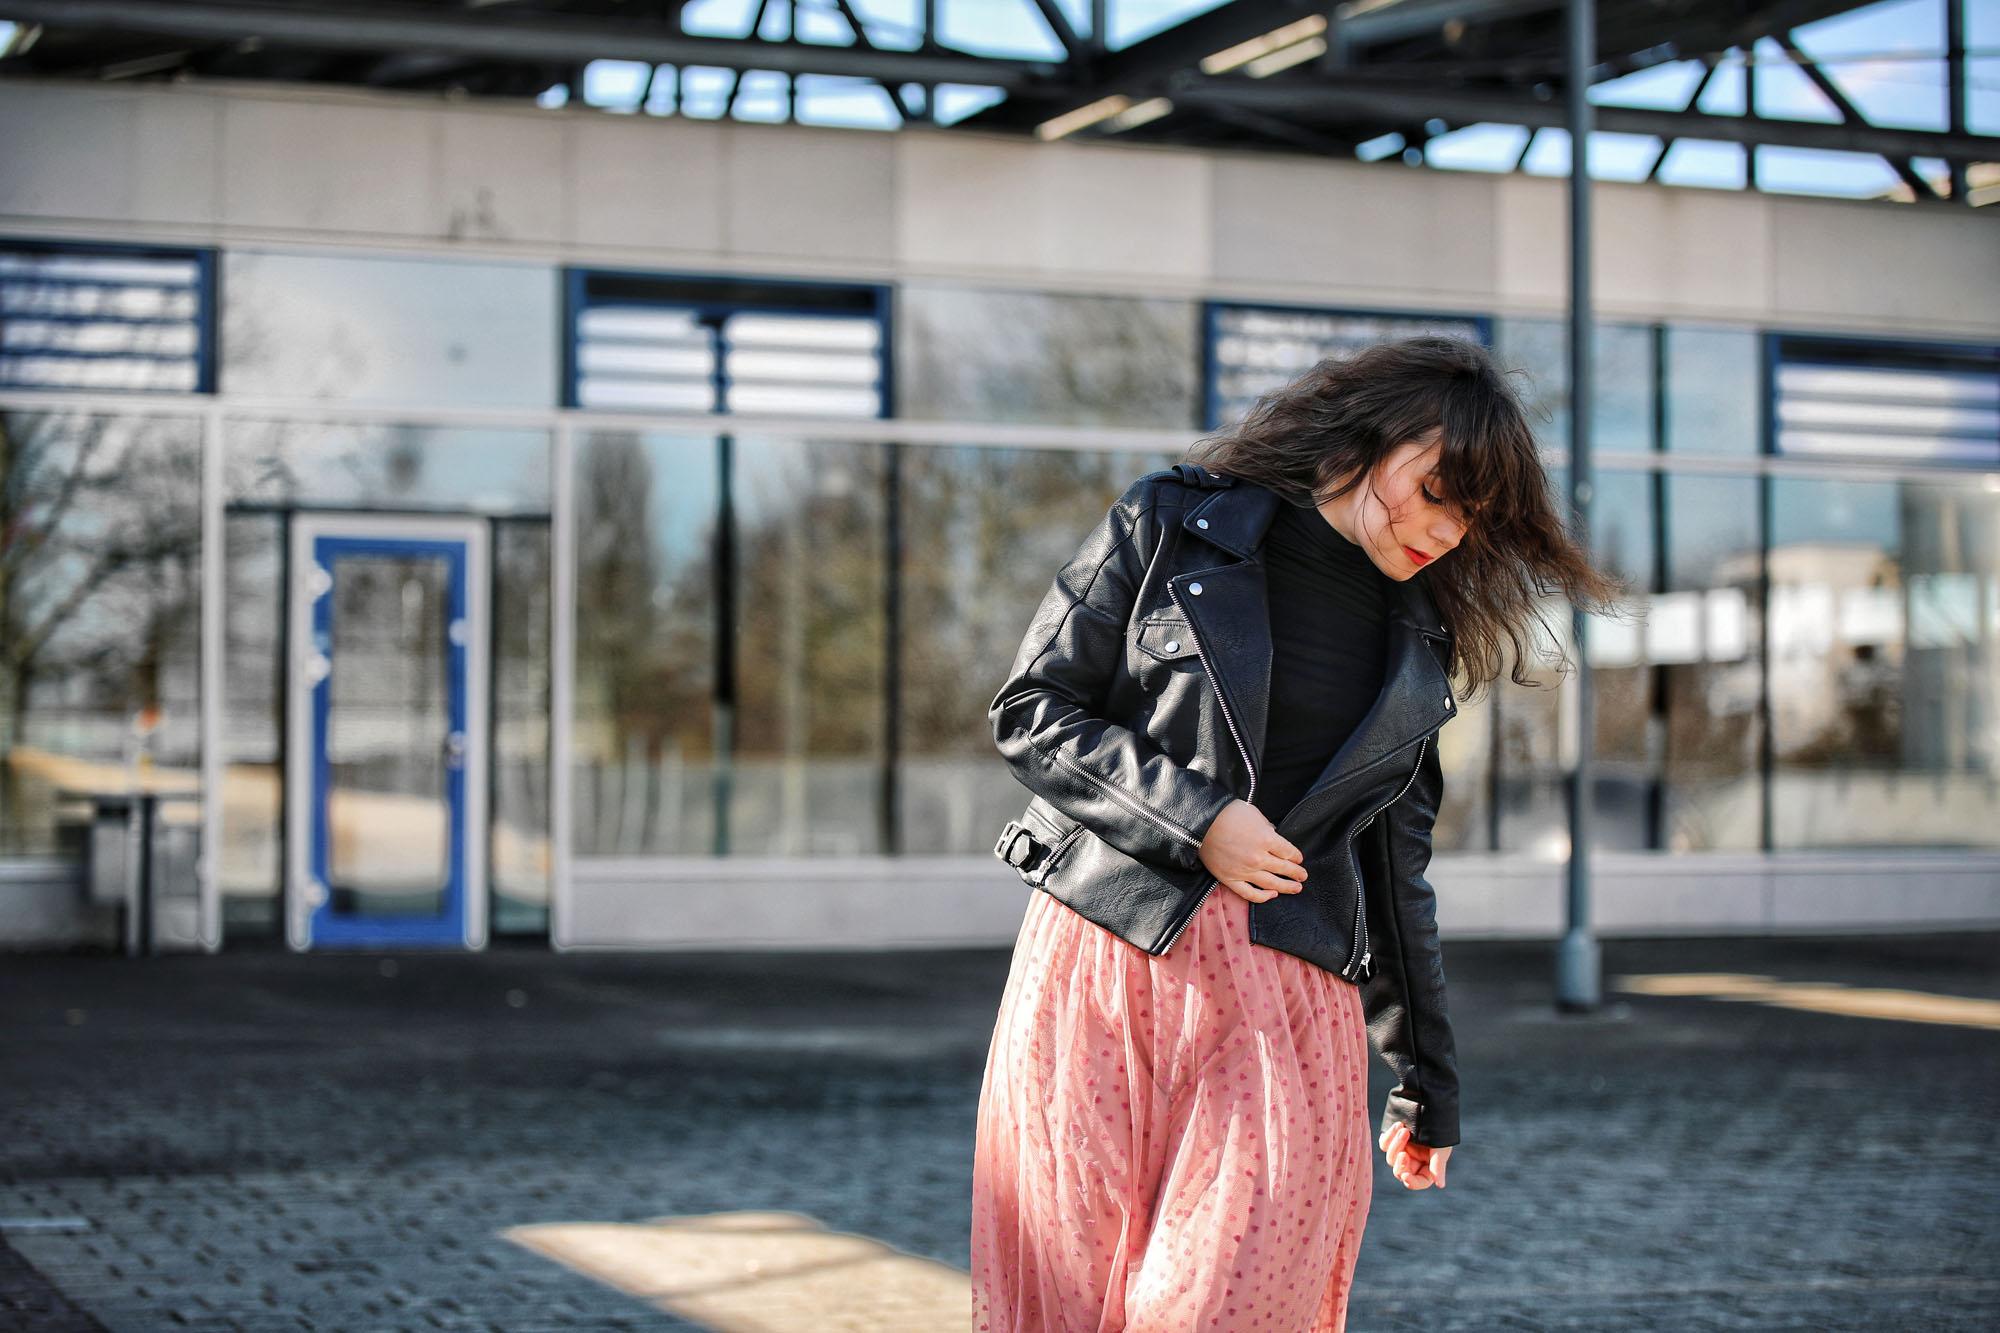 Tüllrock-kombinieren-Frühlingstrend-2018-Modeblog-Style by An